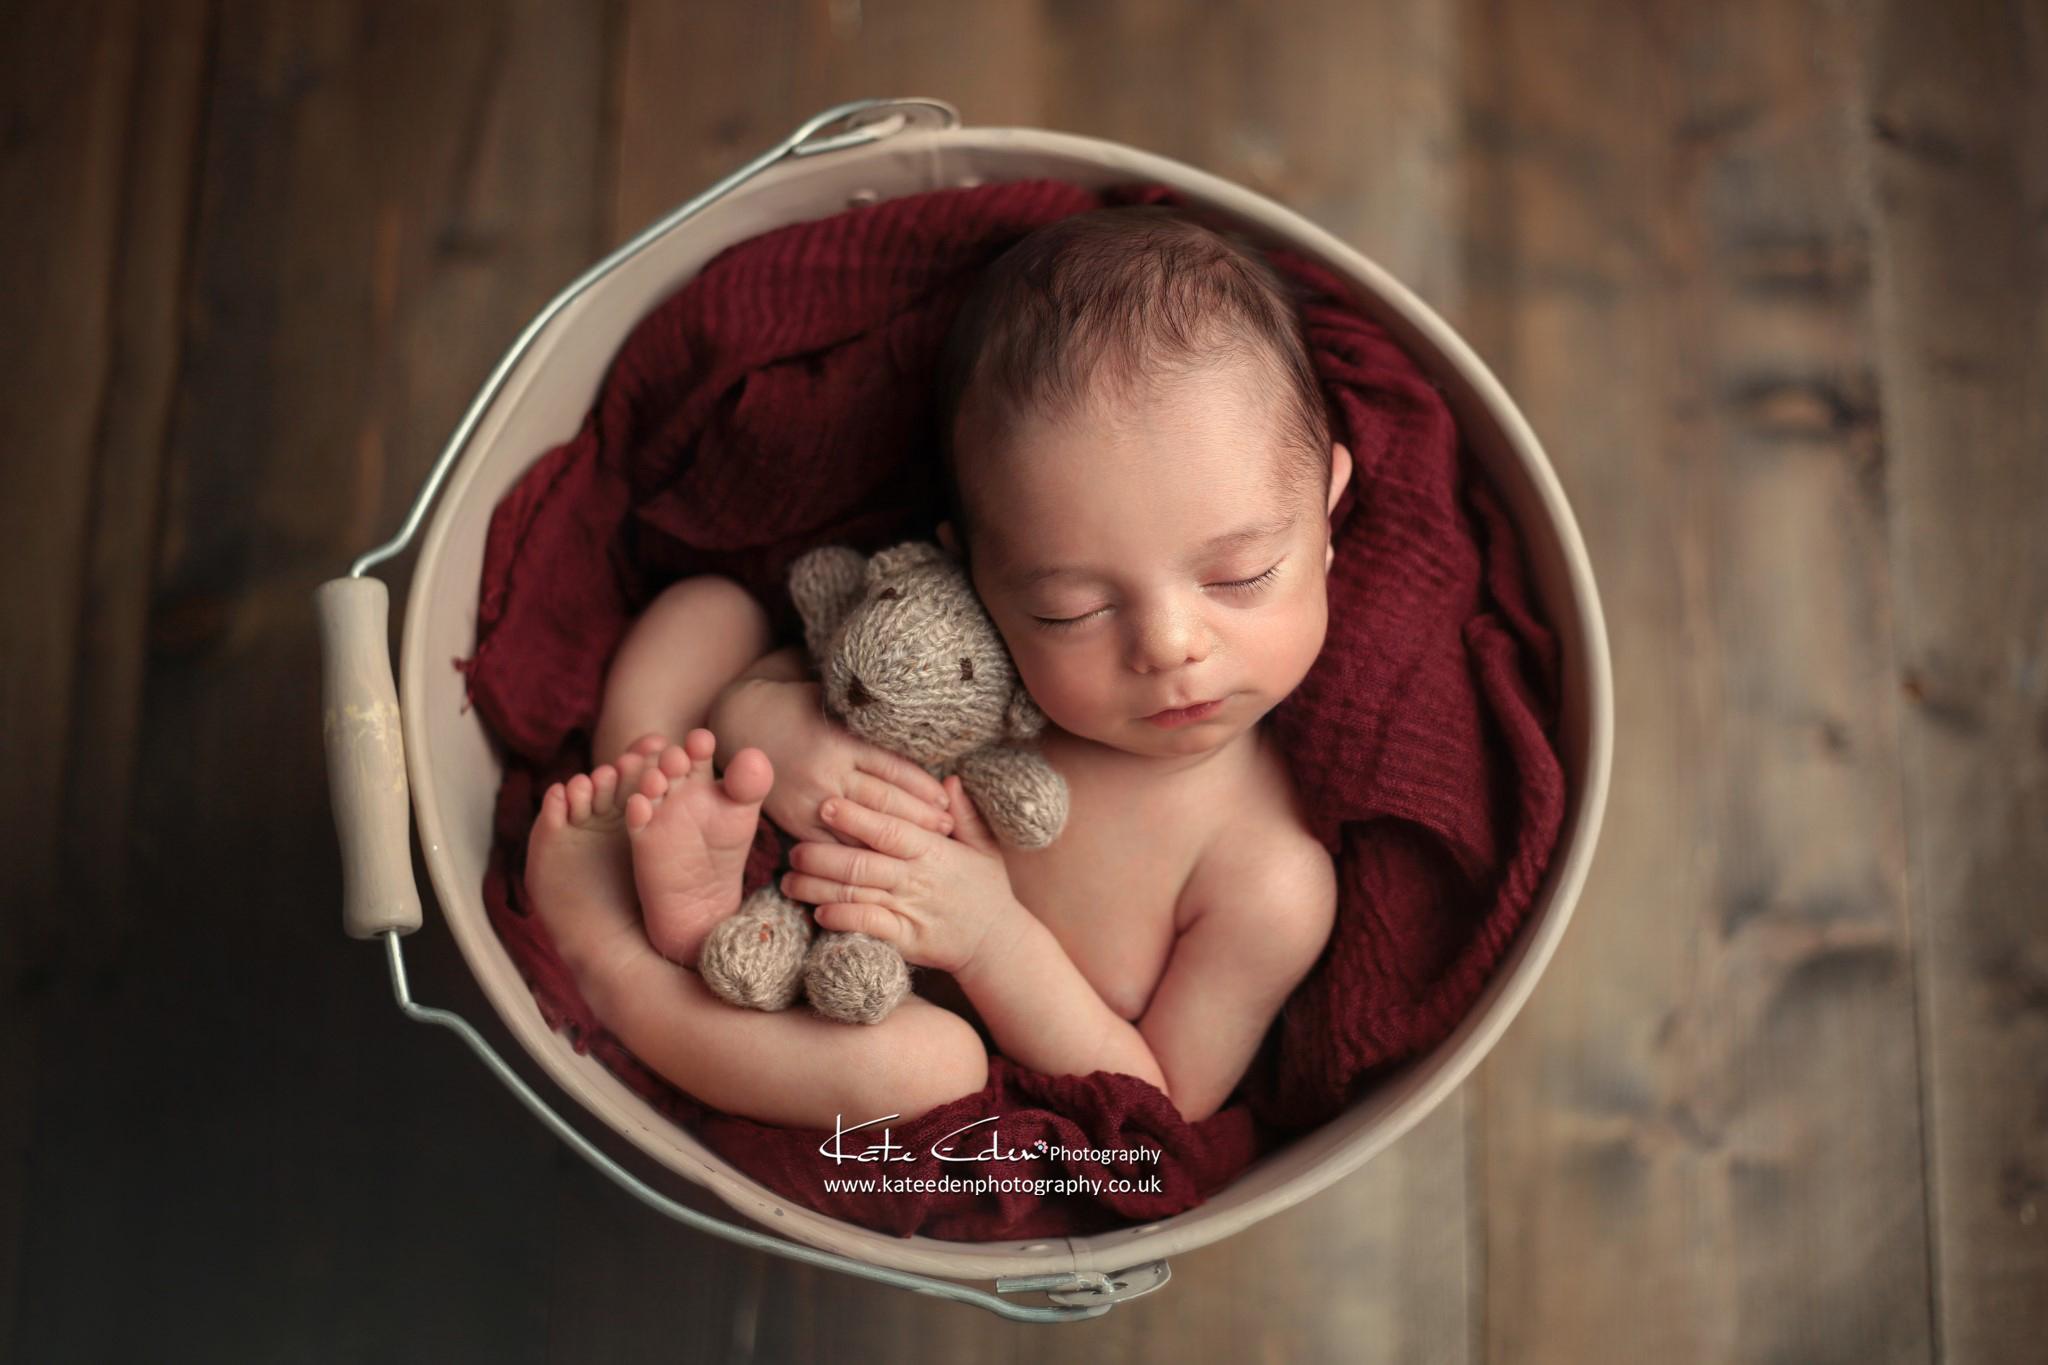 Newborn baby boy with teddy bear - Kate Eden Photography - Milton Keynes Newborn photographer